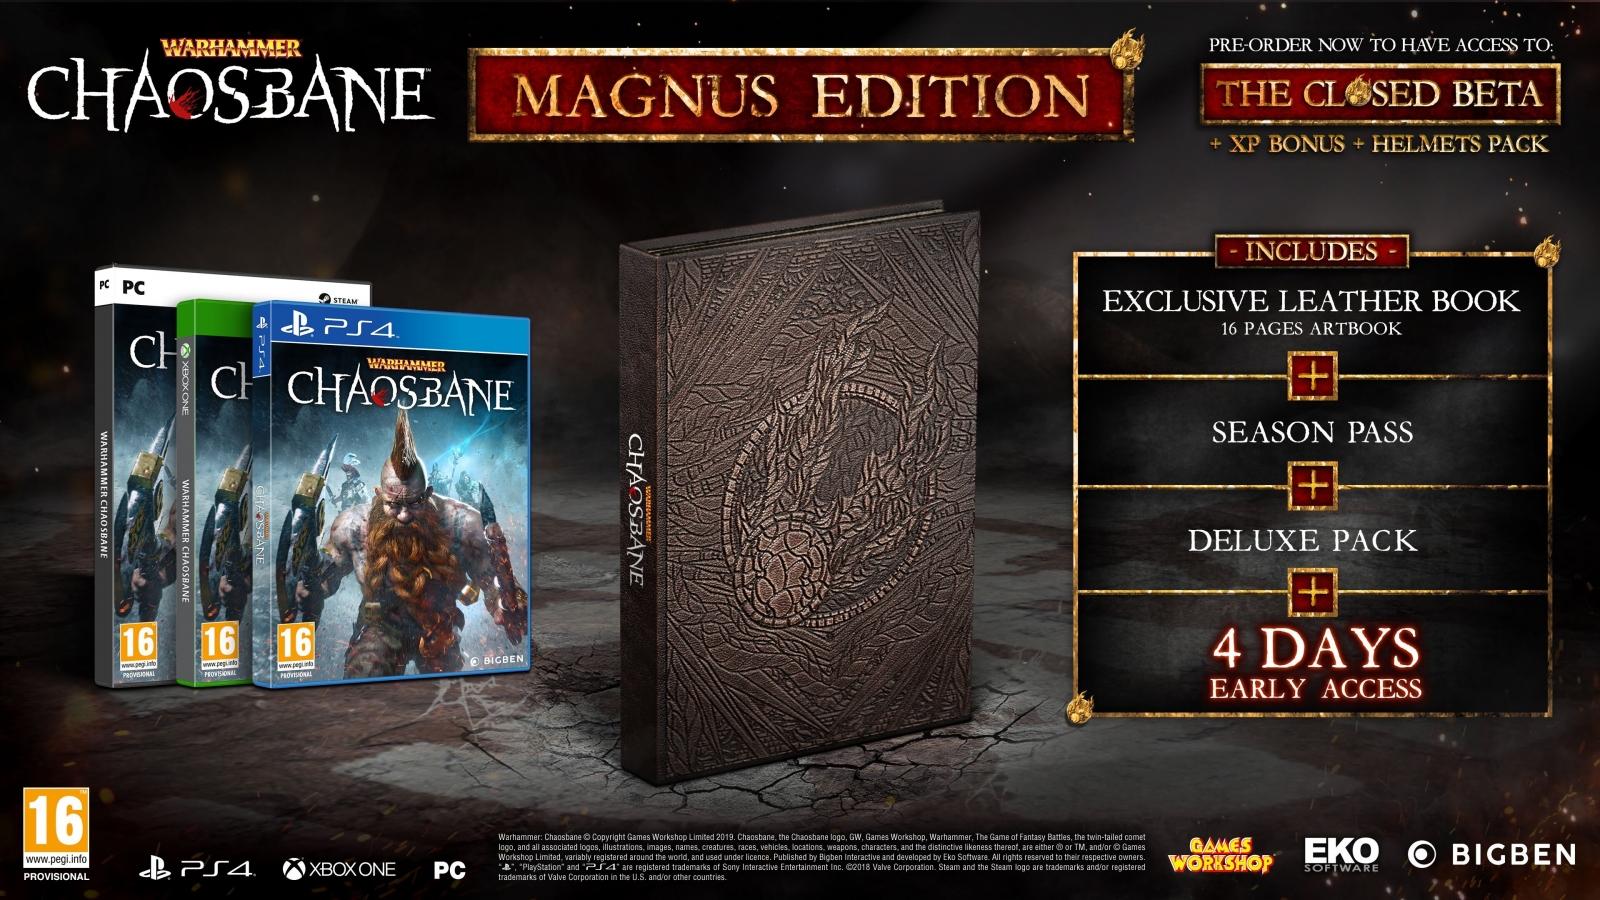 PS4 Warhammer Chaosbane Magnus Edition